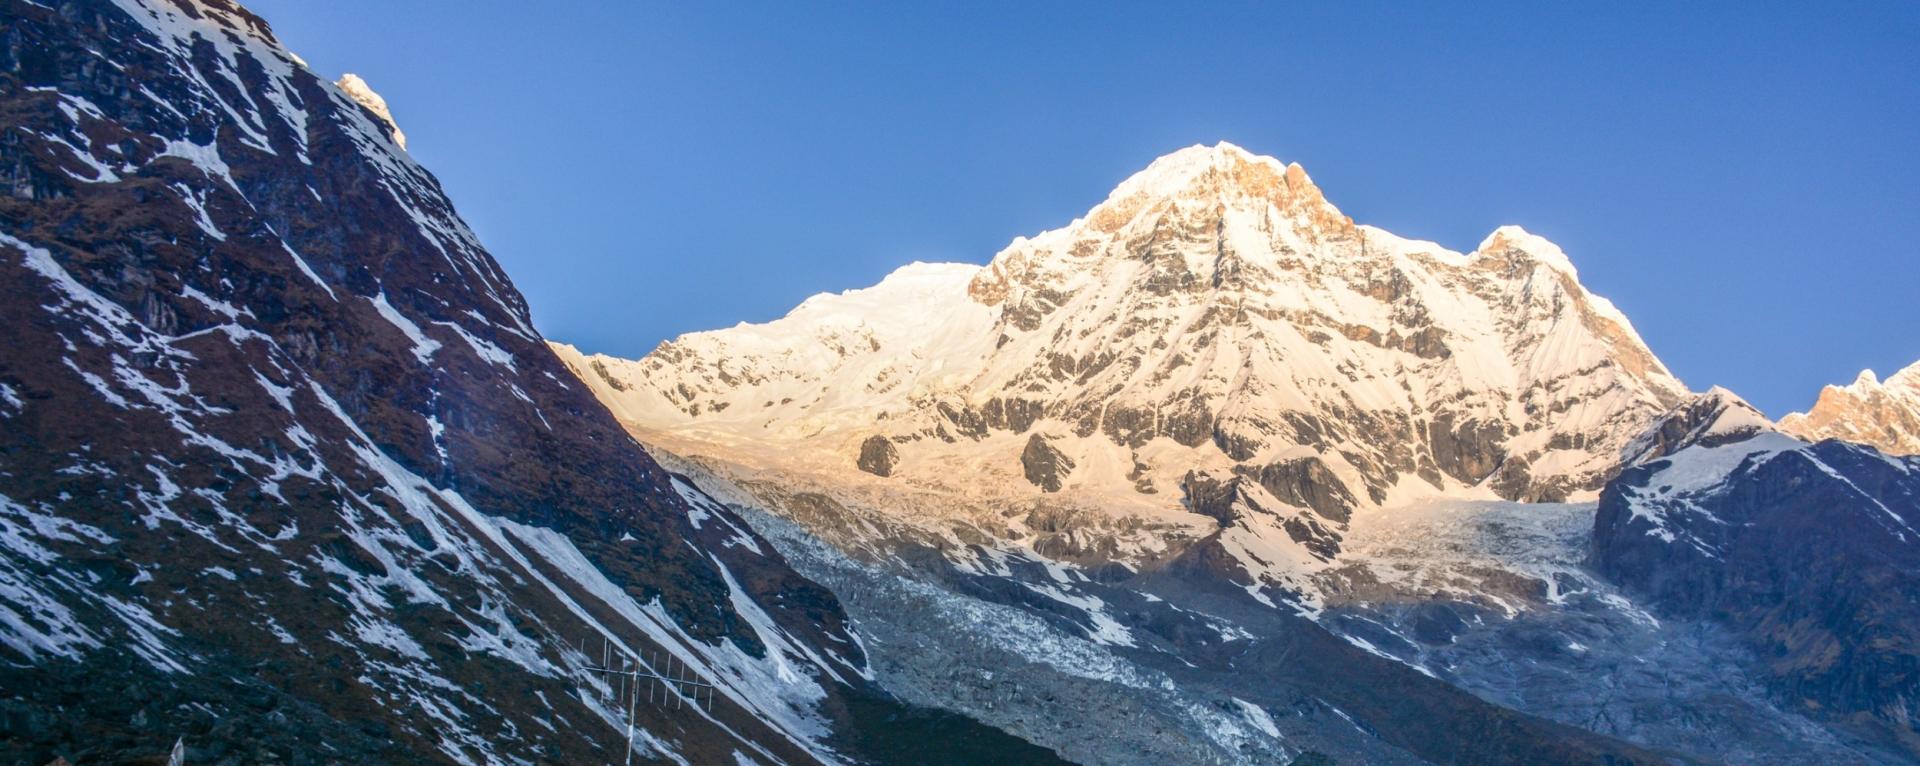 Mt.Annapurna IV Expedition